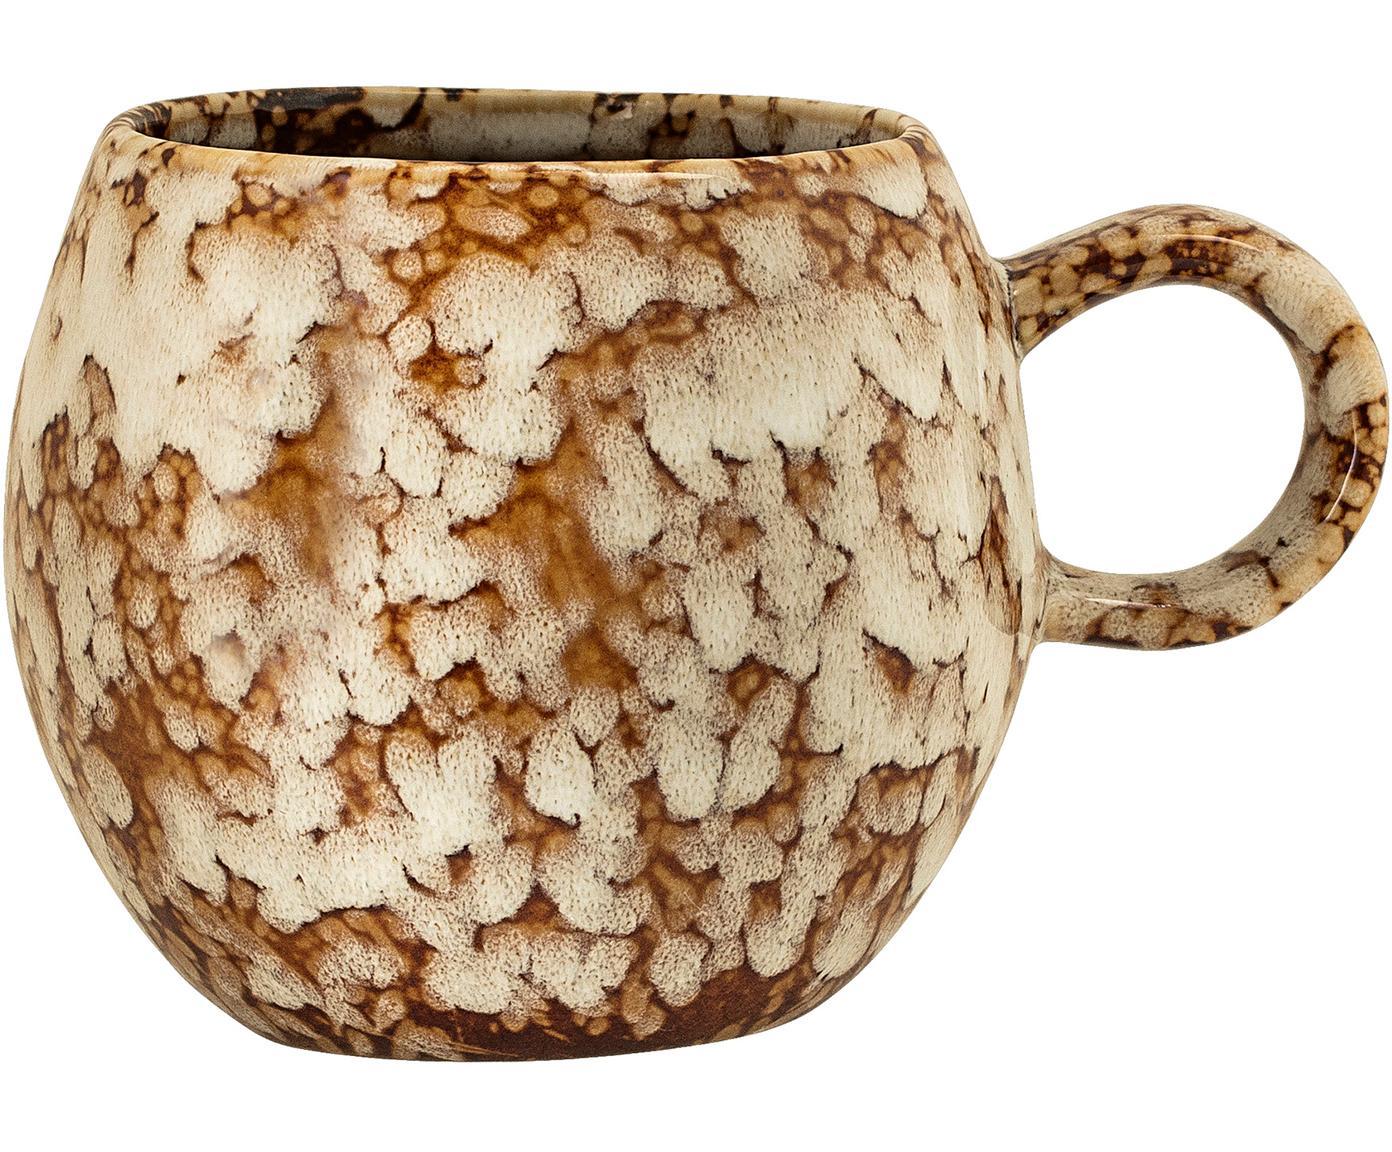 Tasse Paula mit effektvoller Glasur, Steingut, Braun, Cremeweiß, Ø 9 x H 8 cm